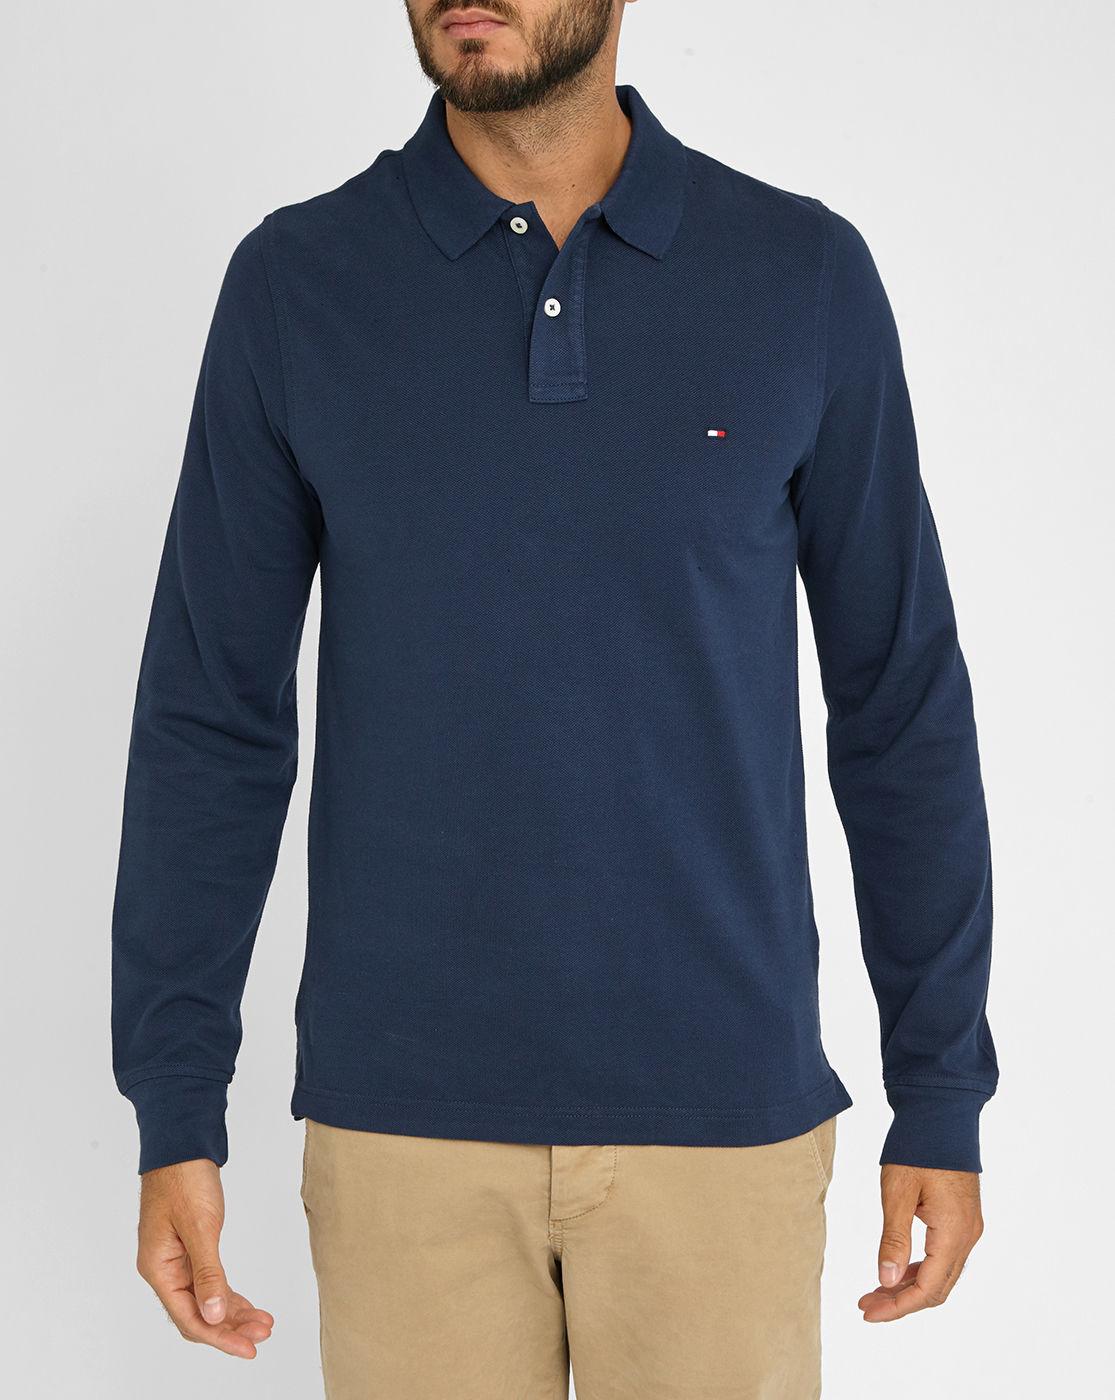 tommy hilfiger navy premium piqu long sleeve polo shirt. Black Bedroom Furniture Sets. Home Design Ideas